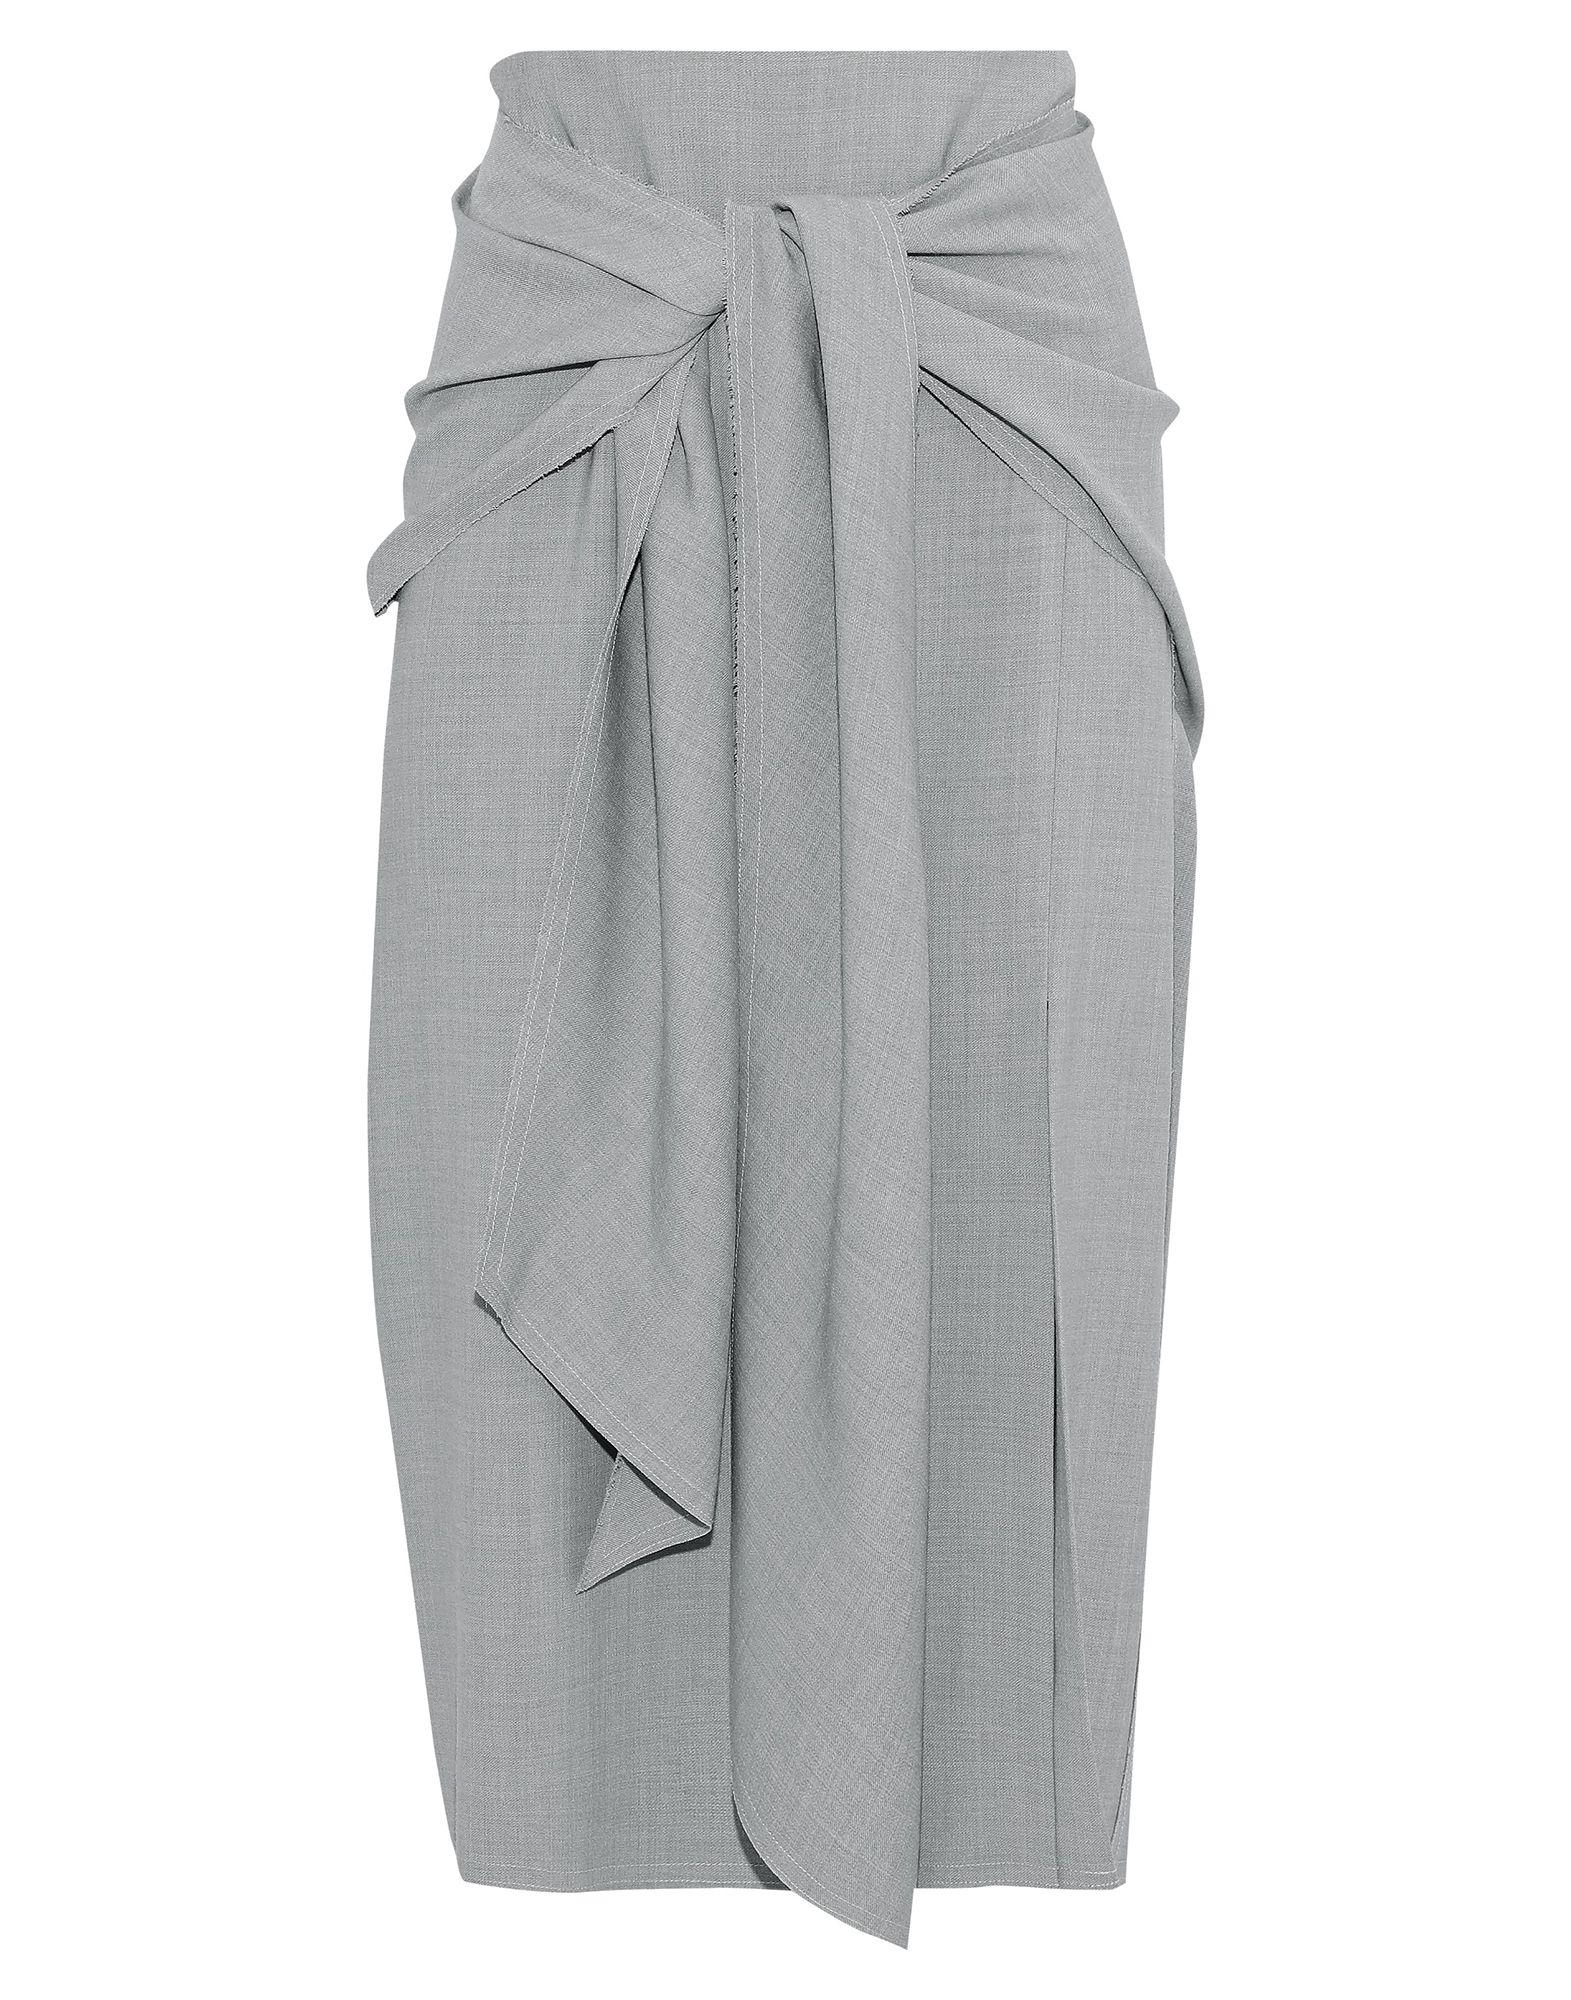 Фото - JASON WU Юбка длиной 3/4 jason wu collection юбка длиной 3 4